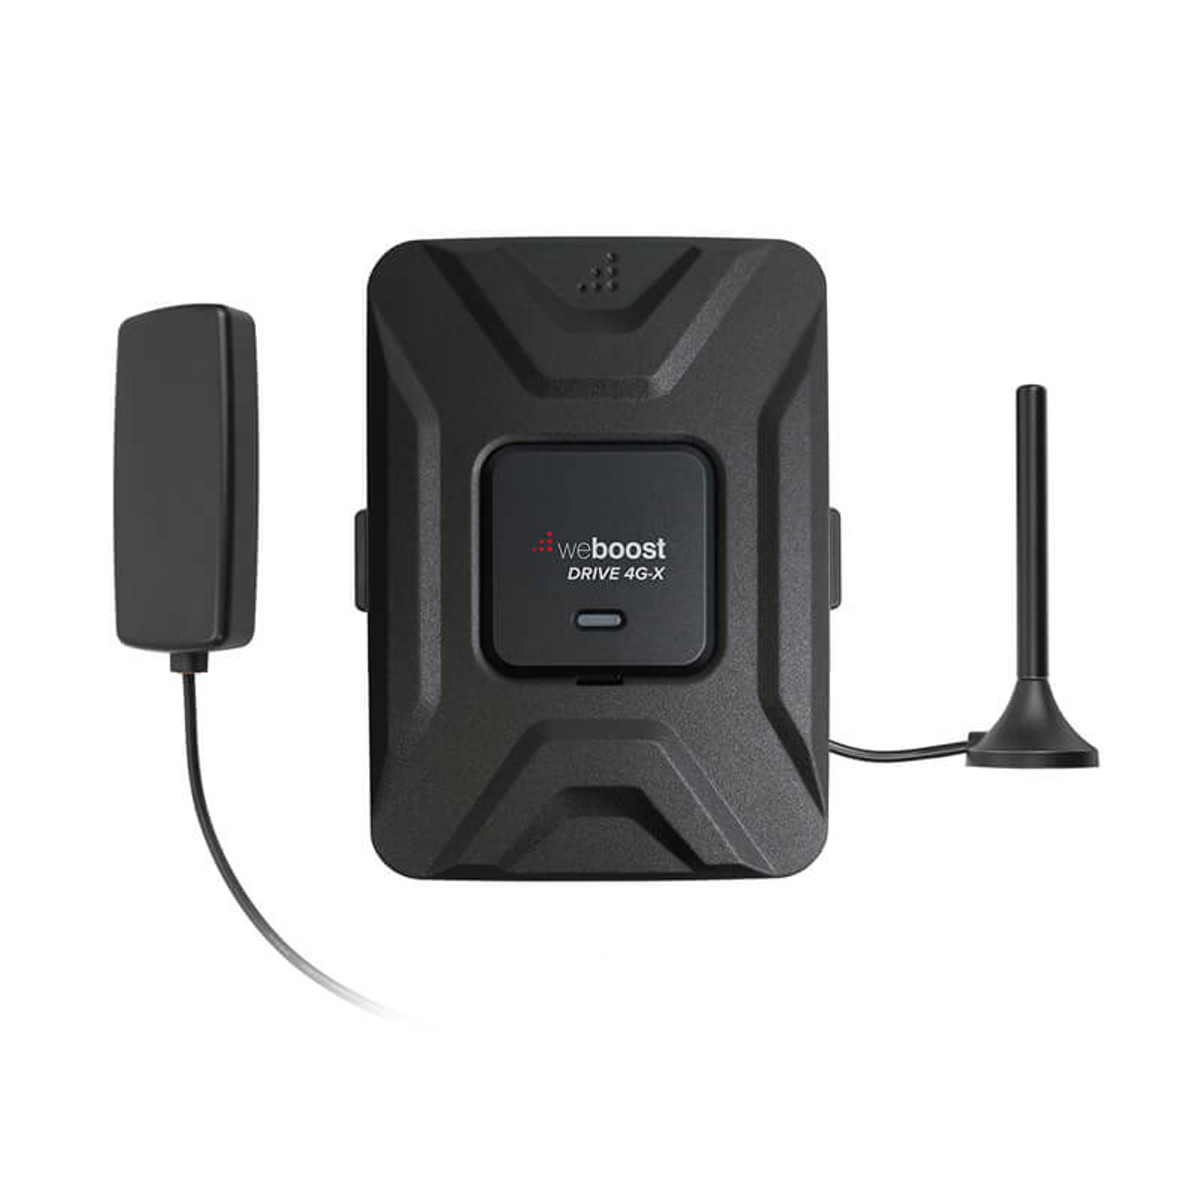 Wilson weBoost Drive 4G-X Cell Phone Signal Booster | 470510